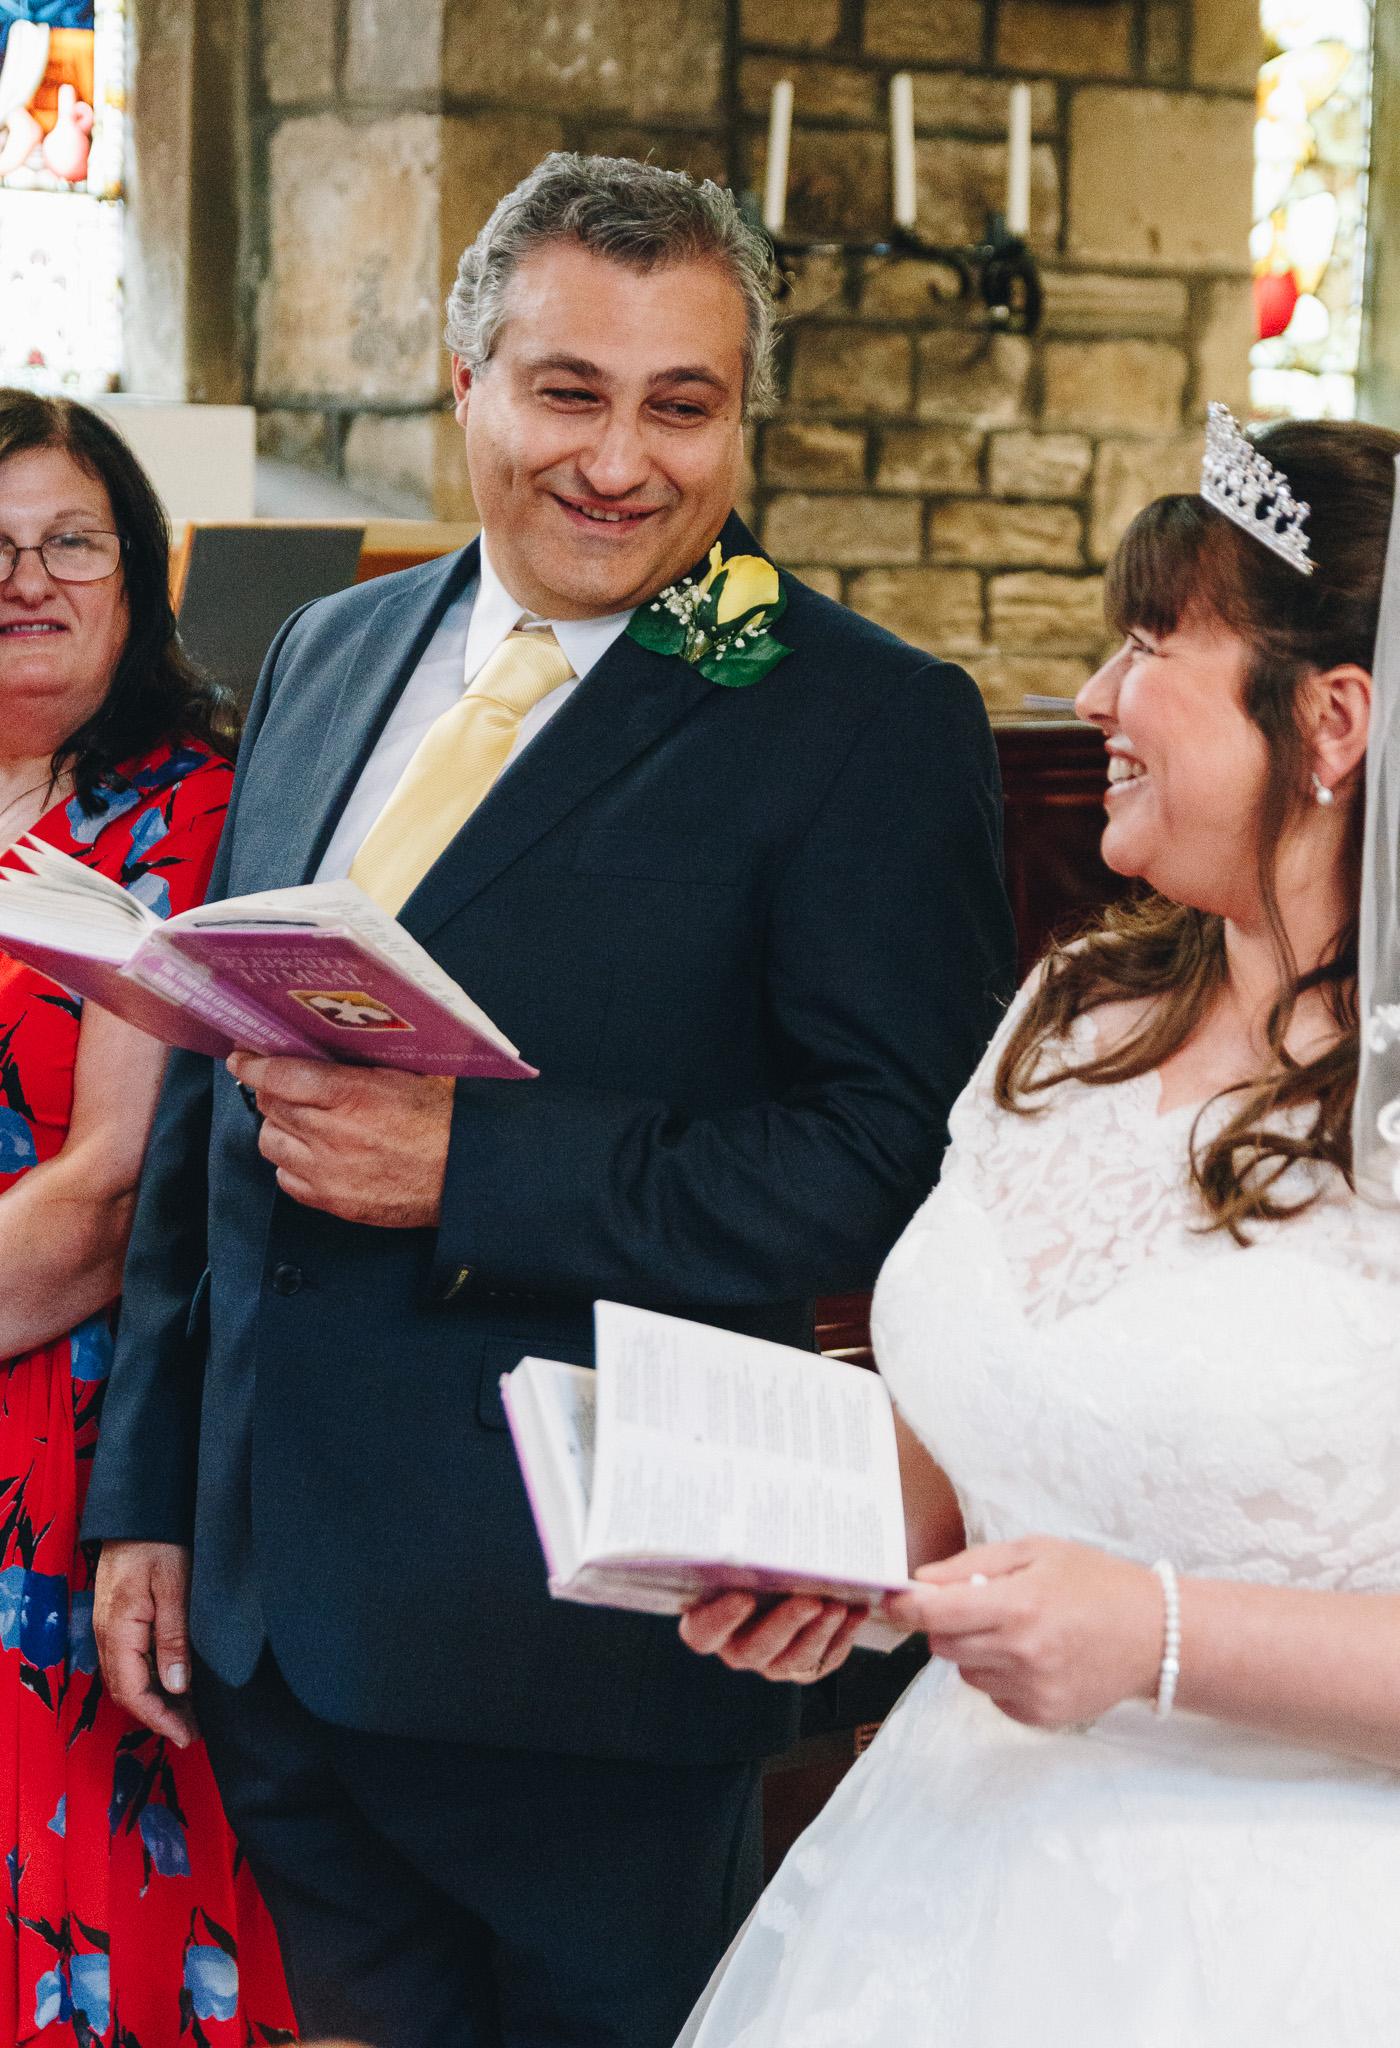 Nat and Sergio Wedding Photos - Website Quality_041.jpg